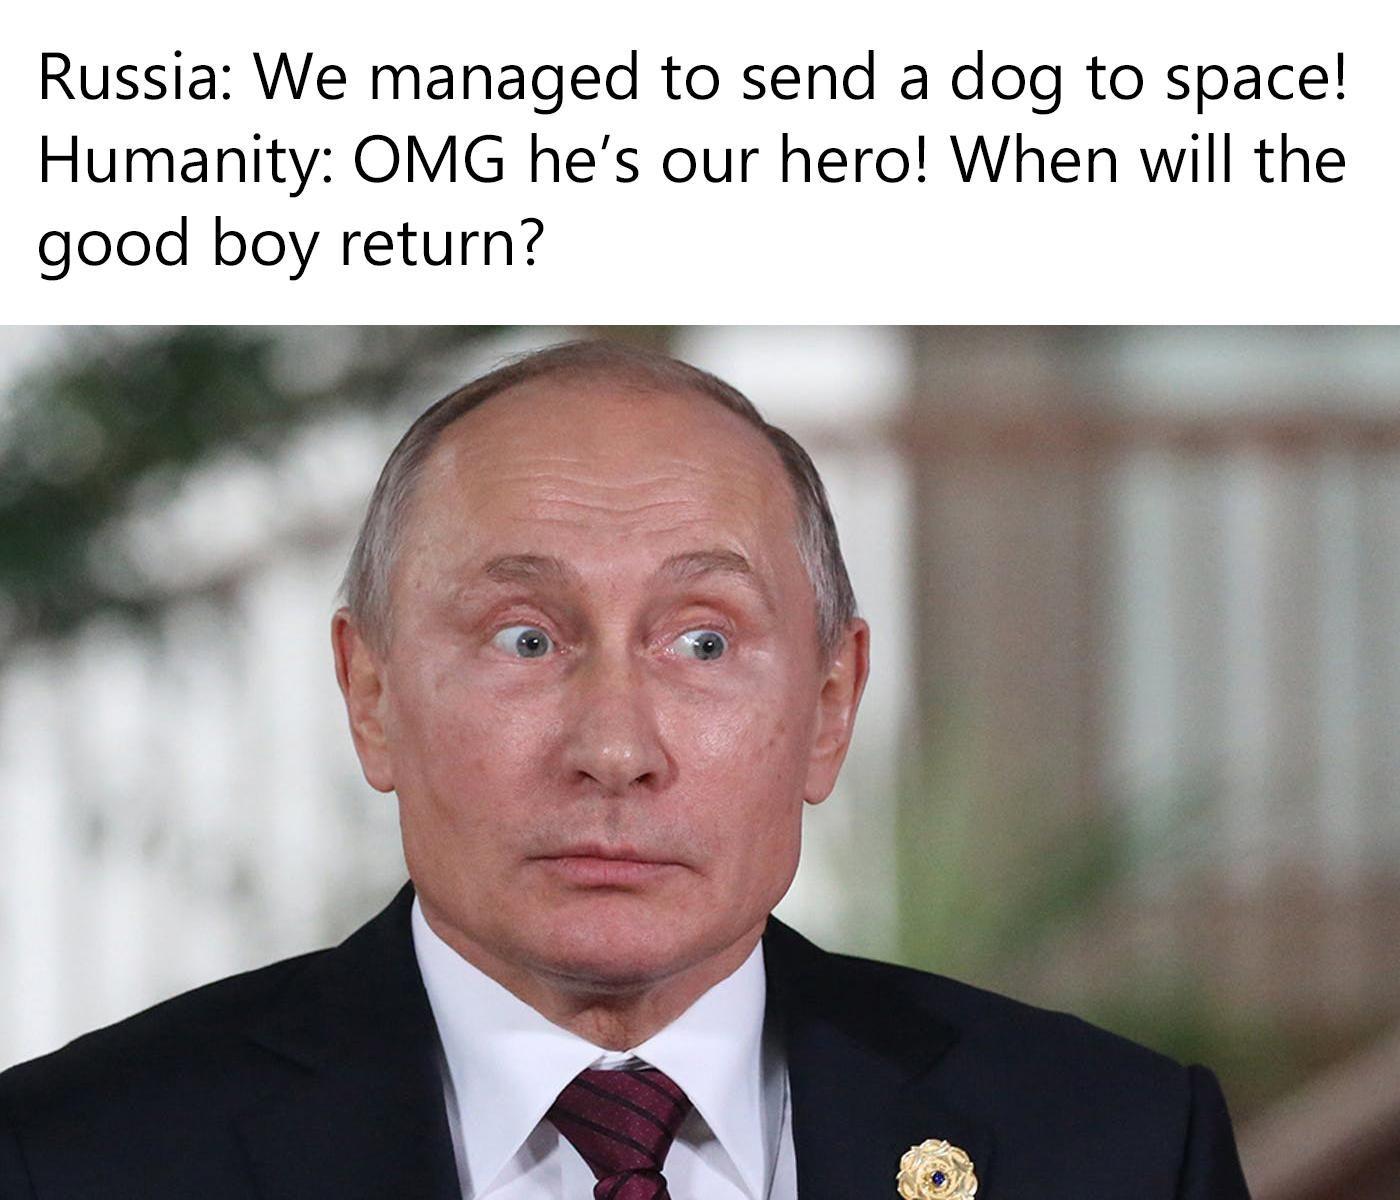 It was Nikita Khrushchev but I like Putin